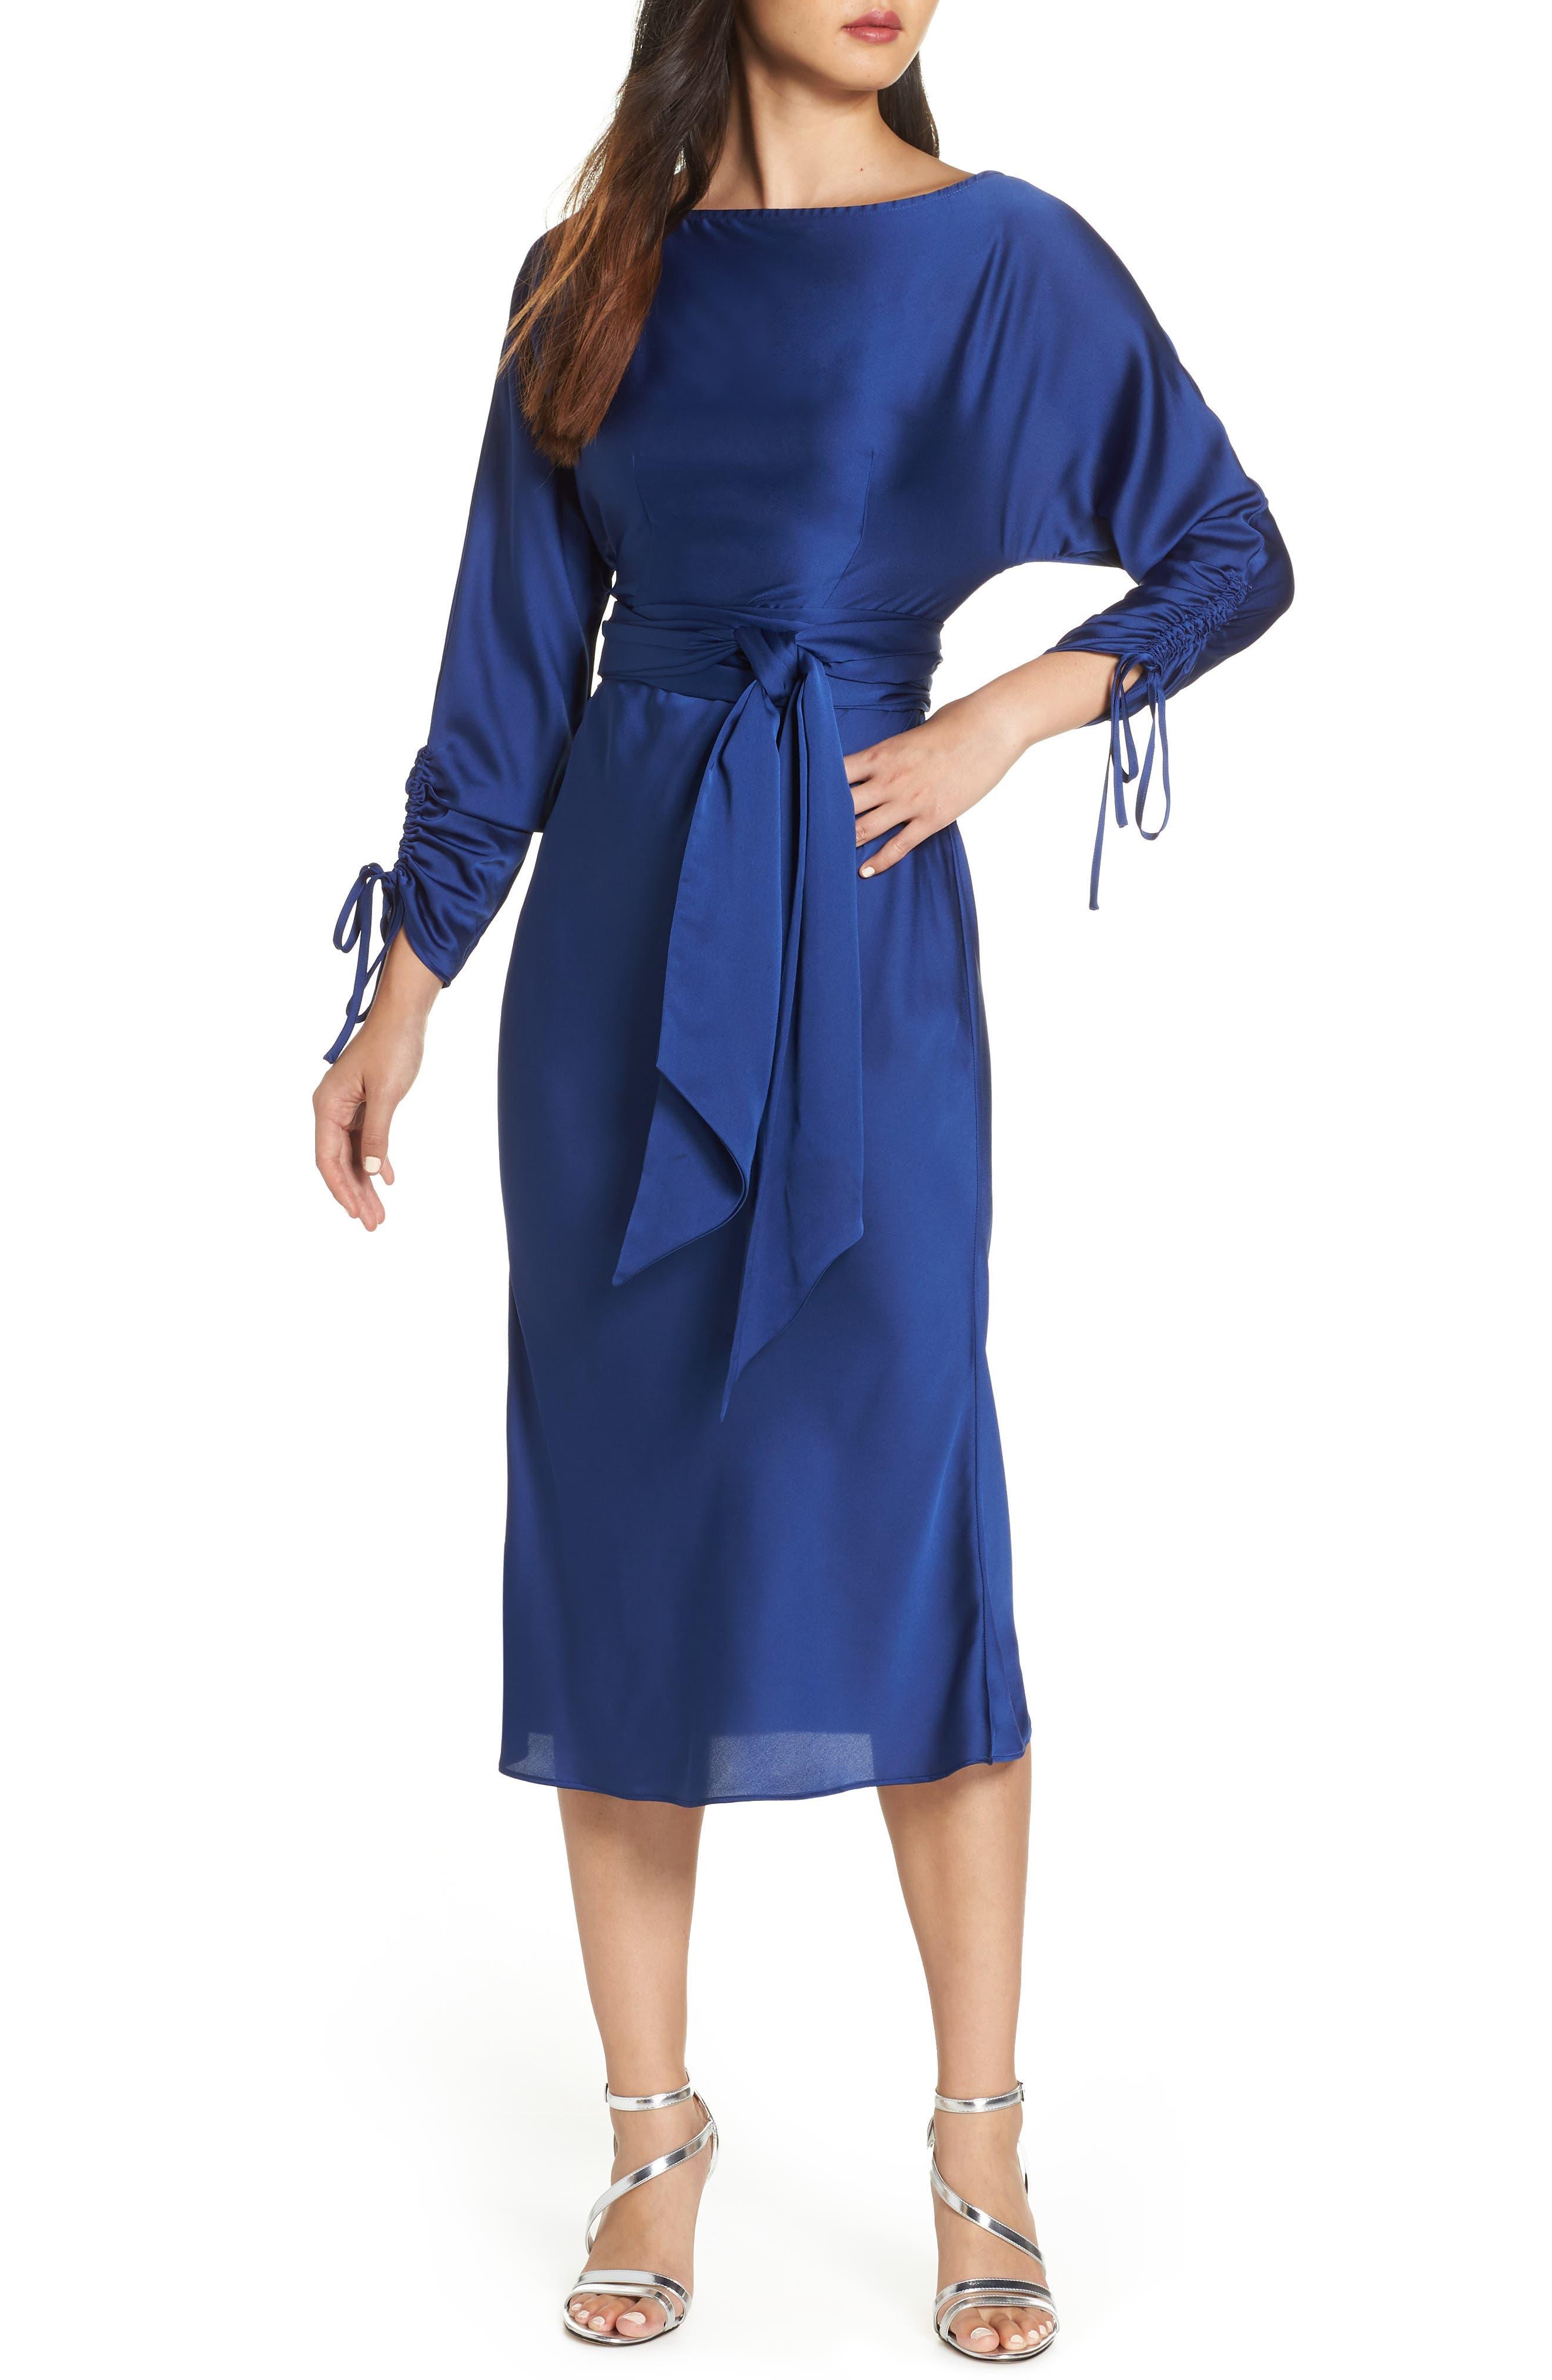 KEEPSAKE THE LABEL Uncovered Midi Dress, Main, color, 430